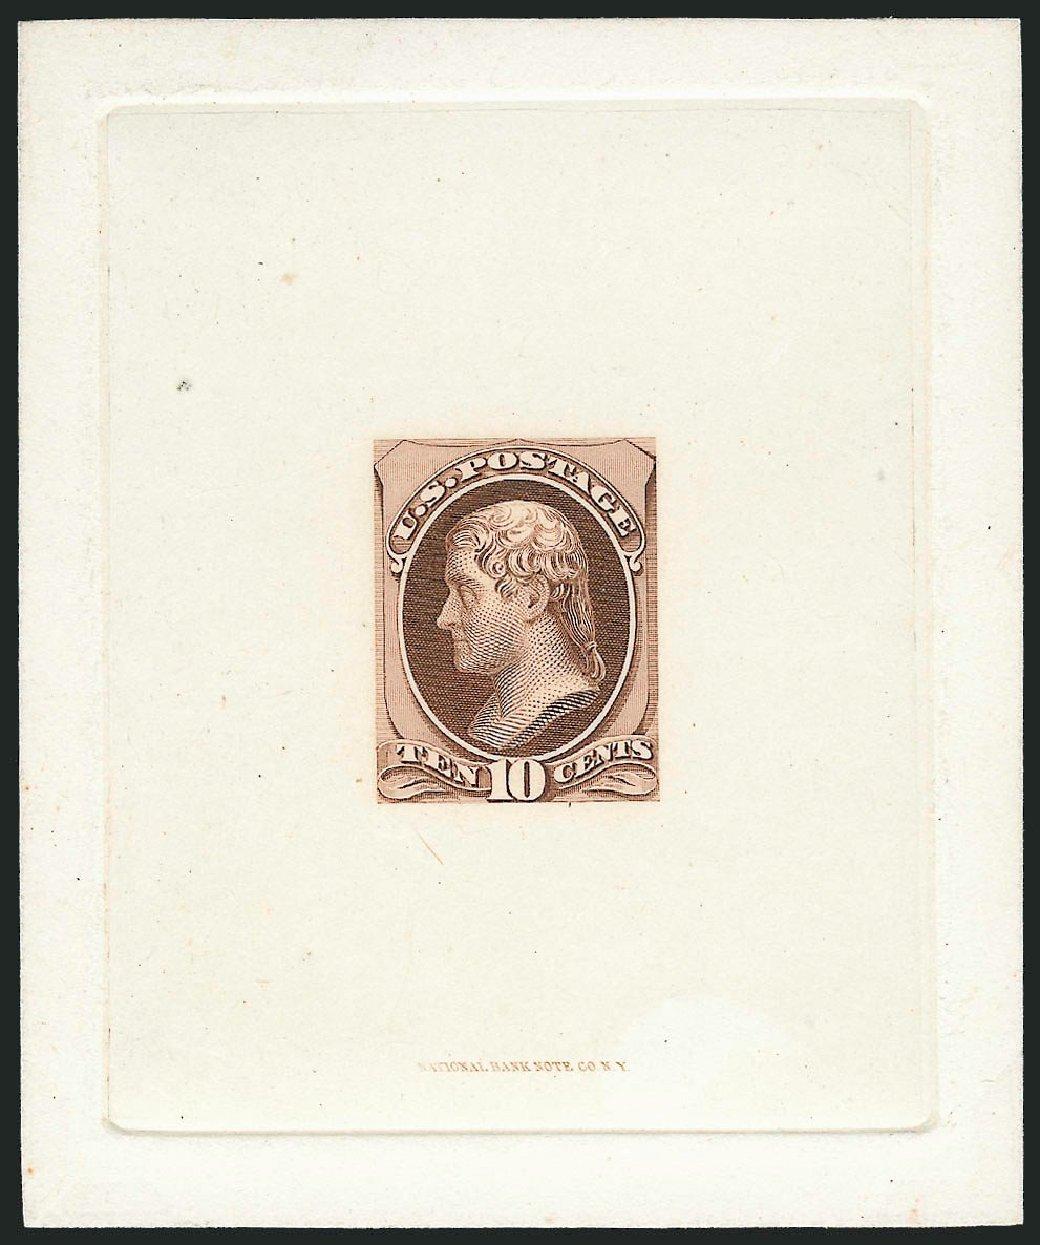 US Stamps Values Scott Catalog 150: 1870 10c Jefferson Without Grill. Robert Siegel Auction Galleries, Nov 2013, Sale 1057, Lot 525